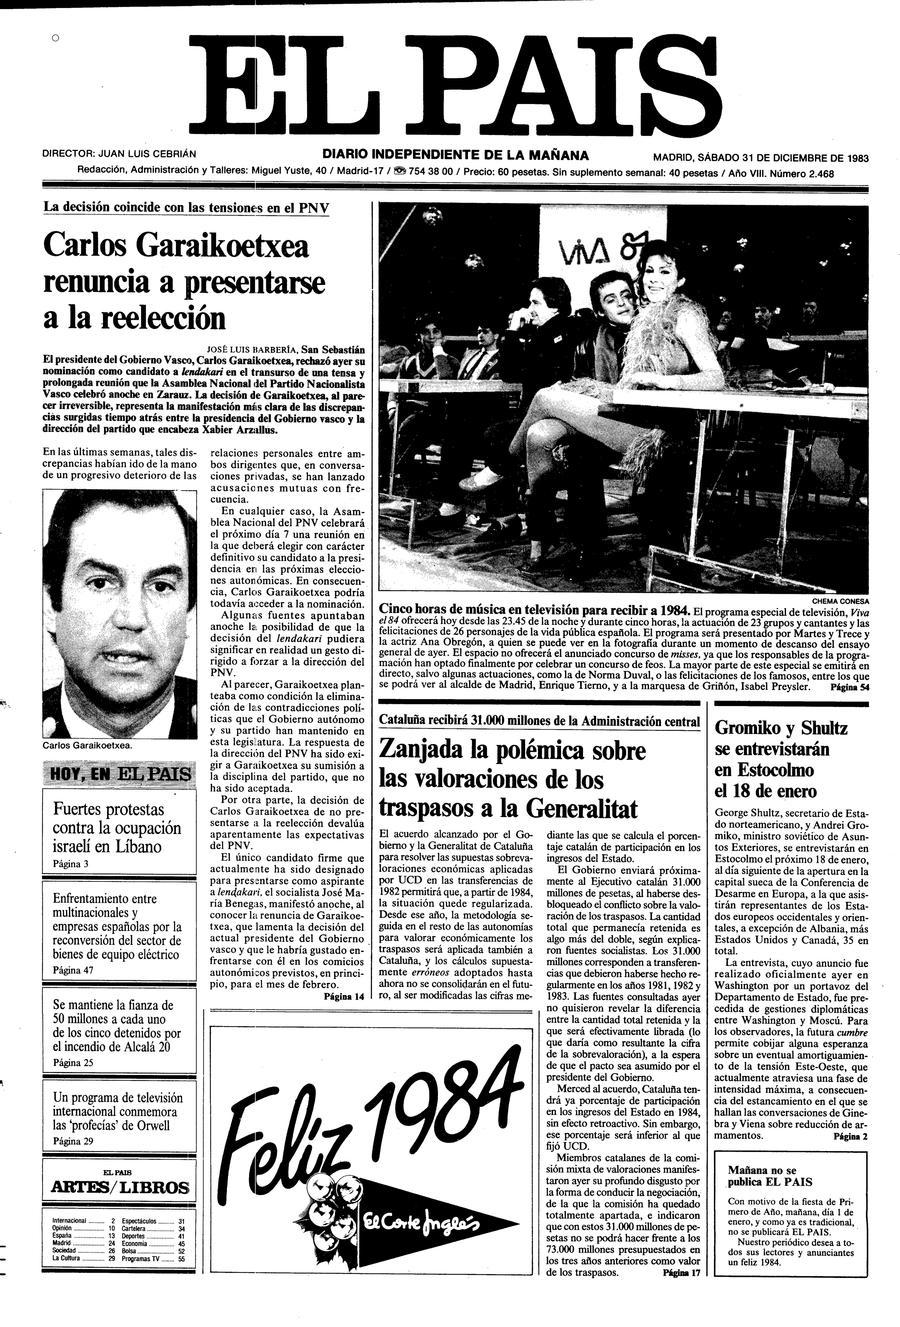 31 de Diciembre de 1983